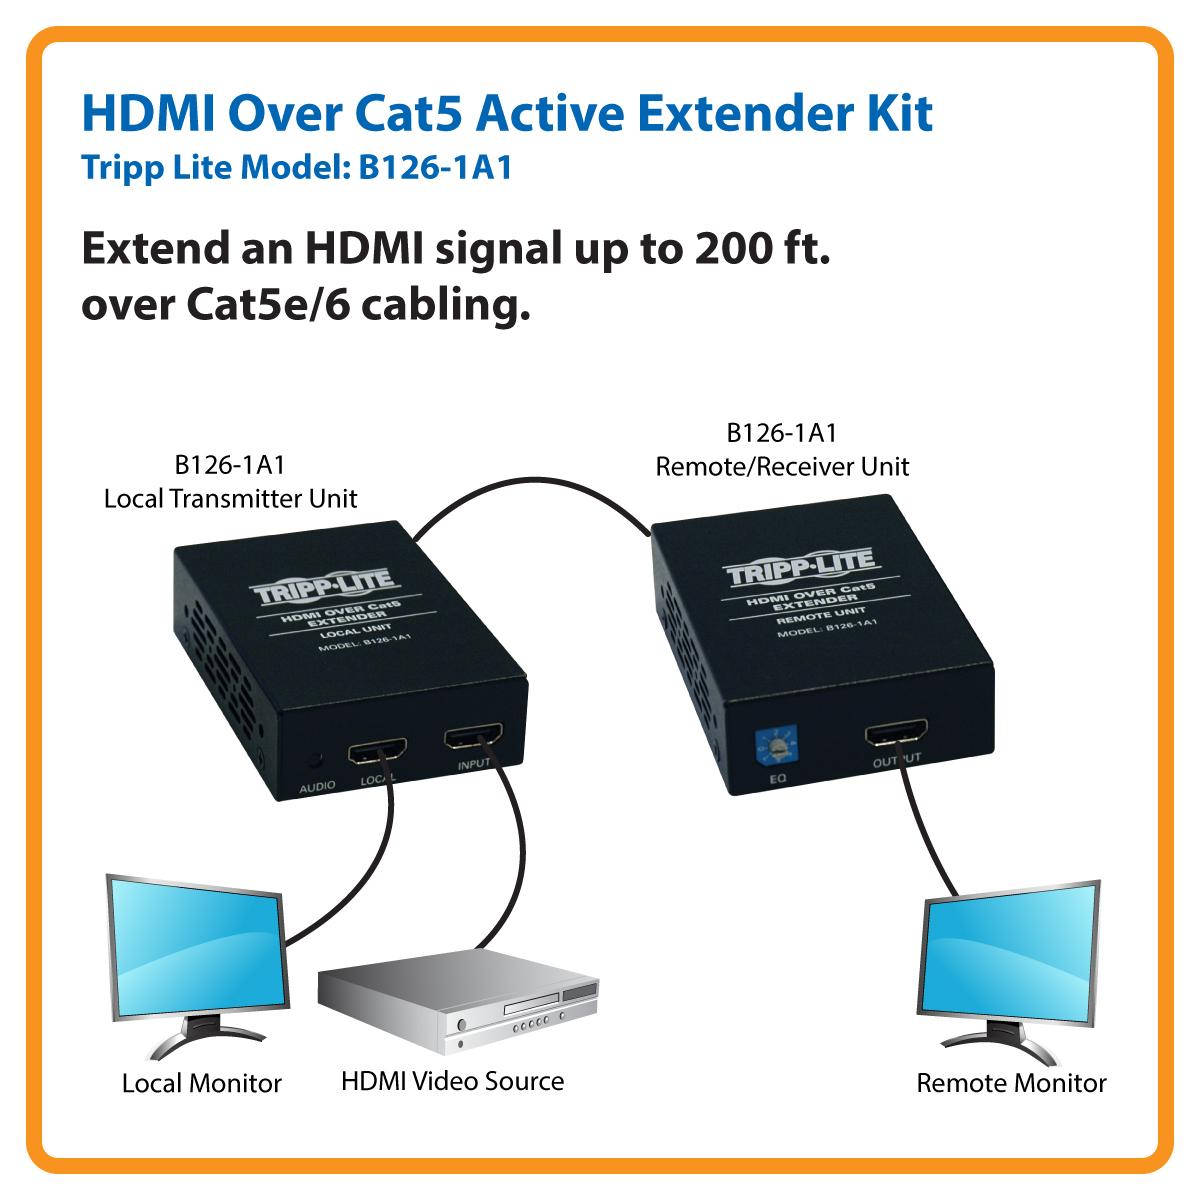 Intcomex Distribuidor Mayorista Con Una Amplia Variedad De Hdmi Over Cat6 Wiring Diagram Cat5 Active Extender Kit For Top Quality Picture And Sound